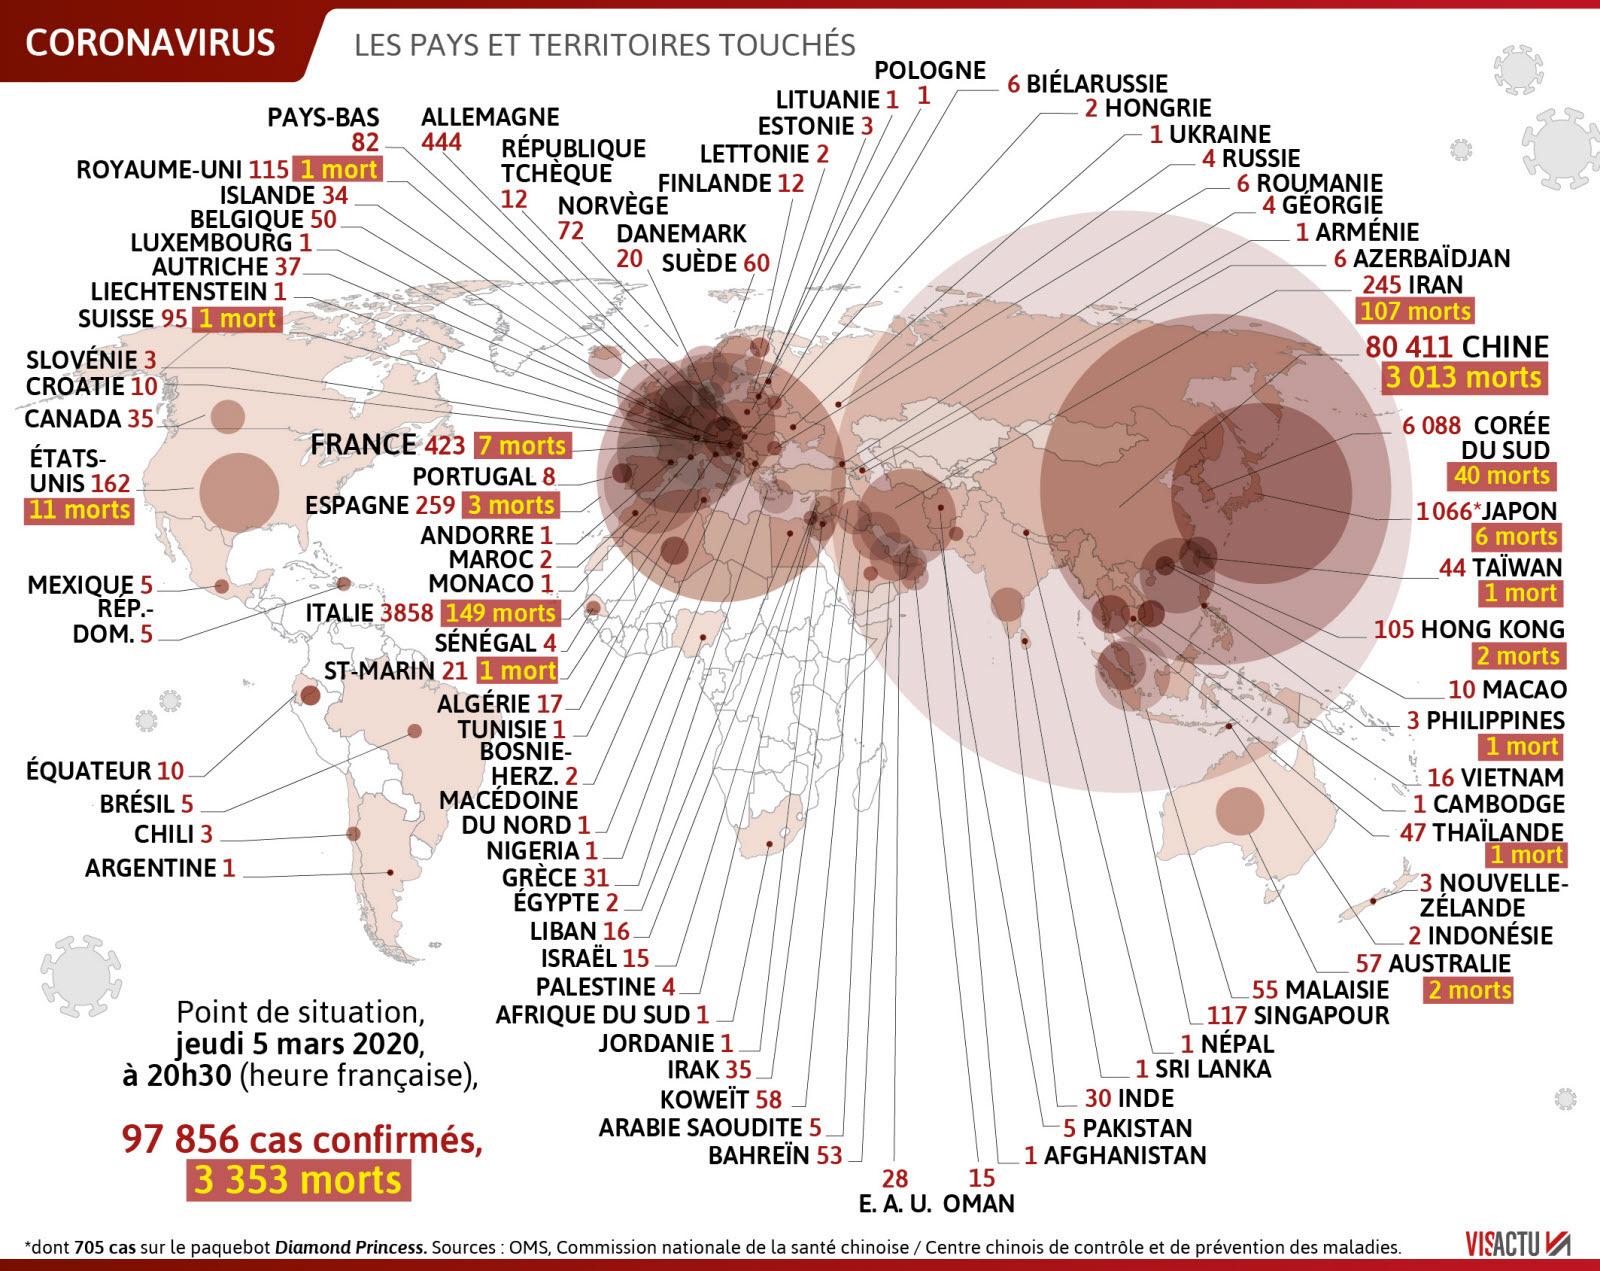 infographie-visactu-1583448090.jpg